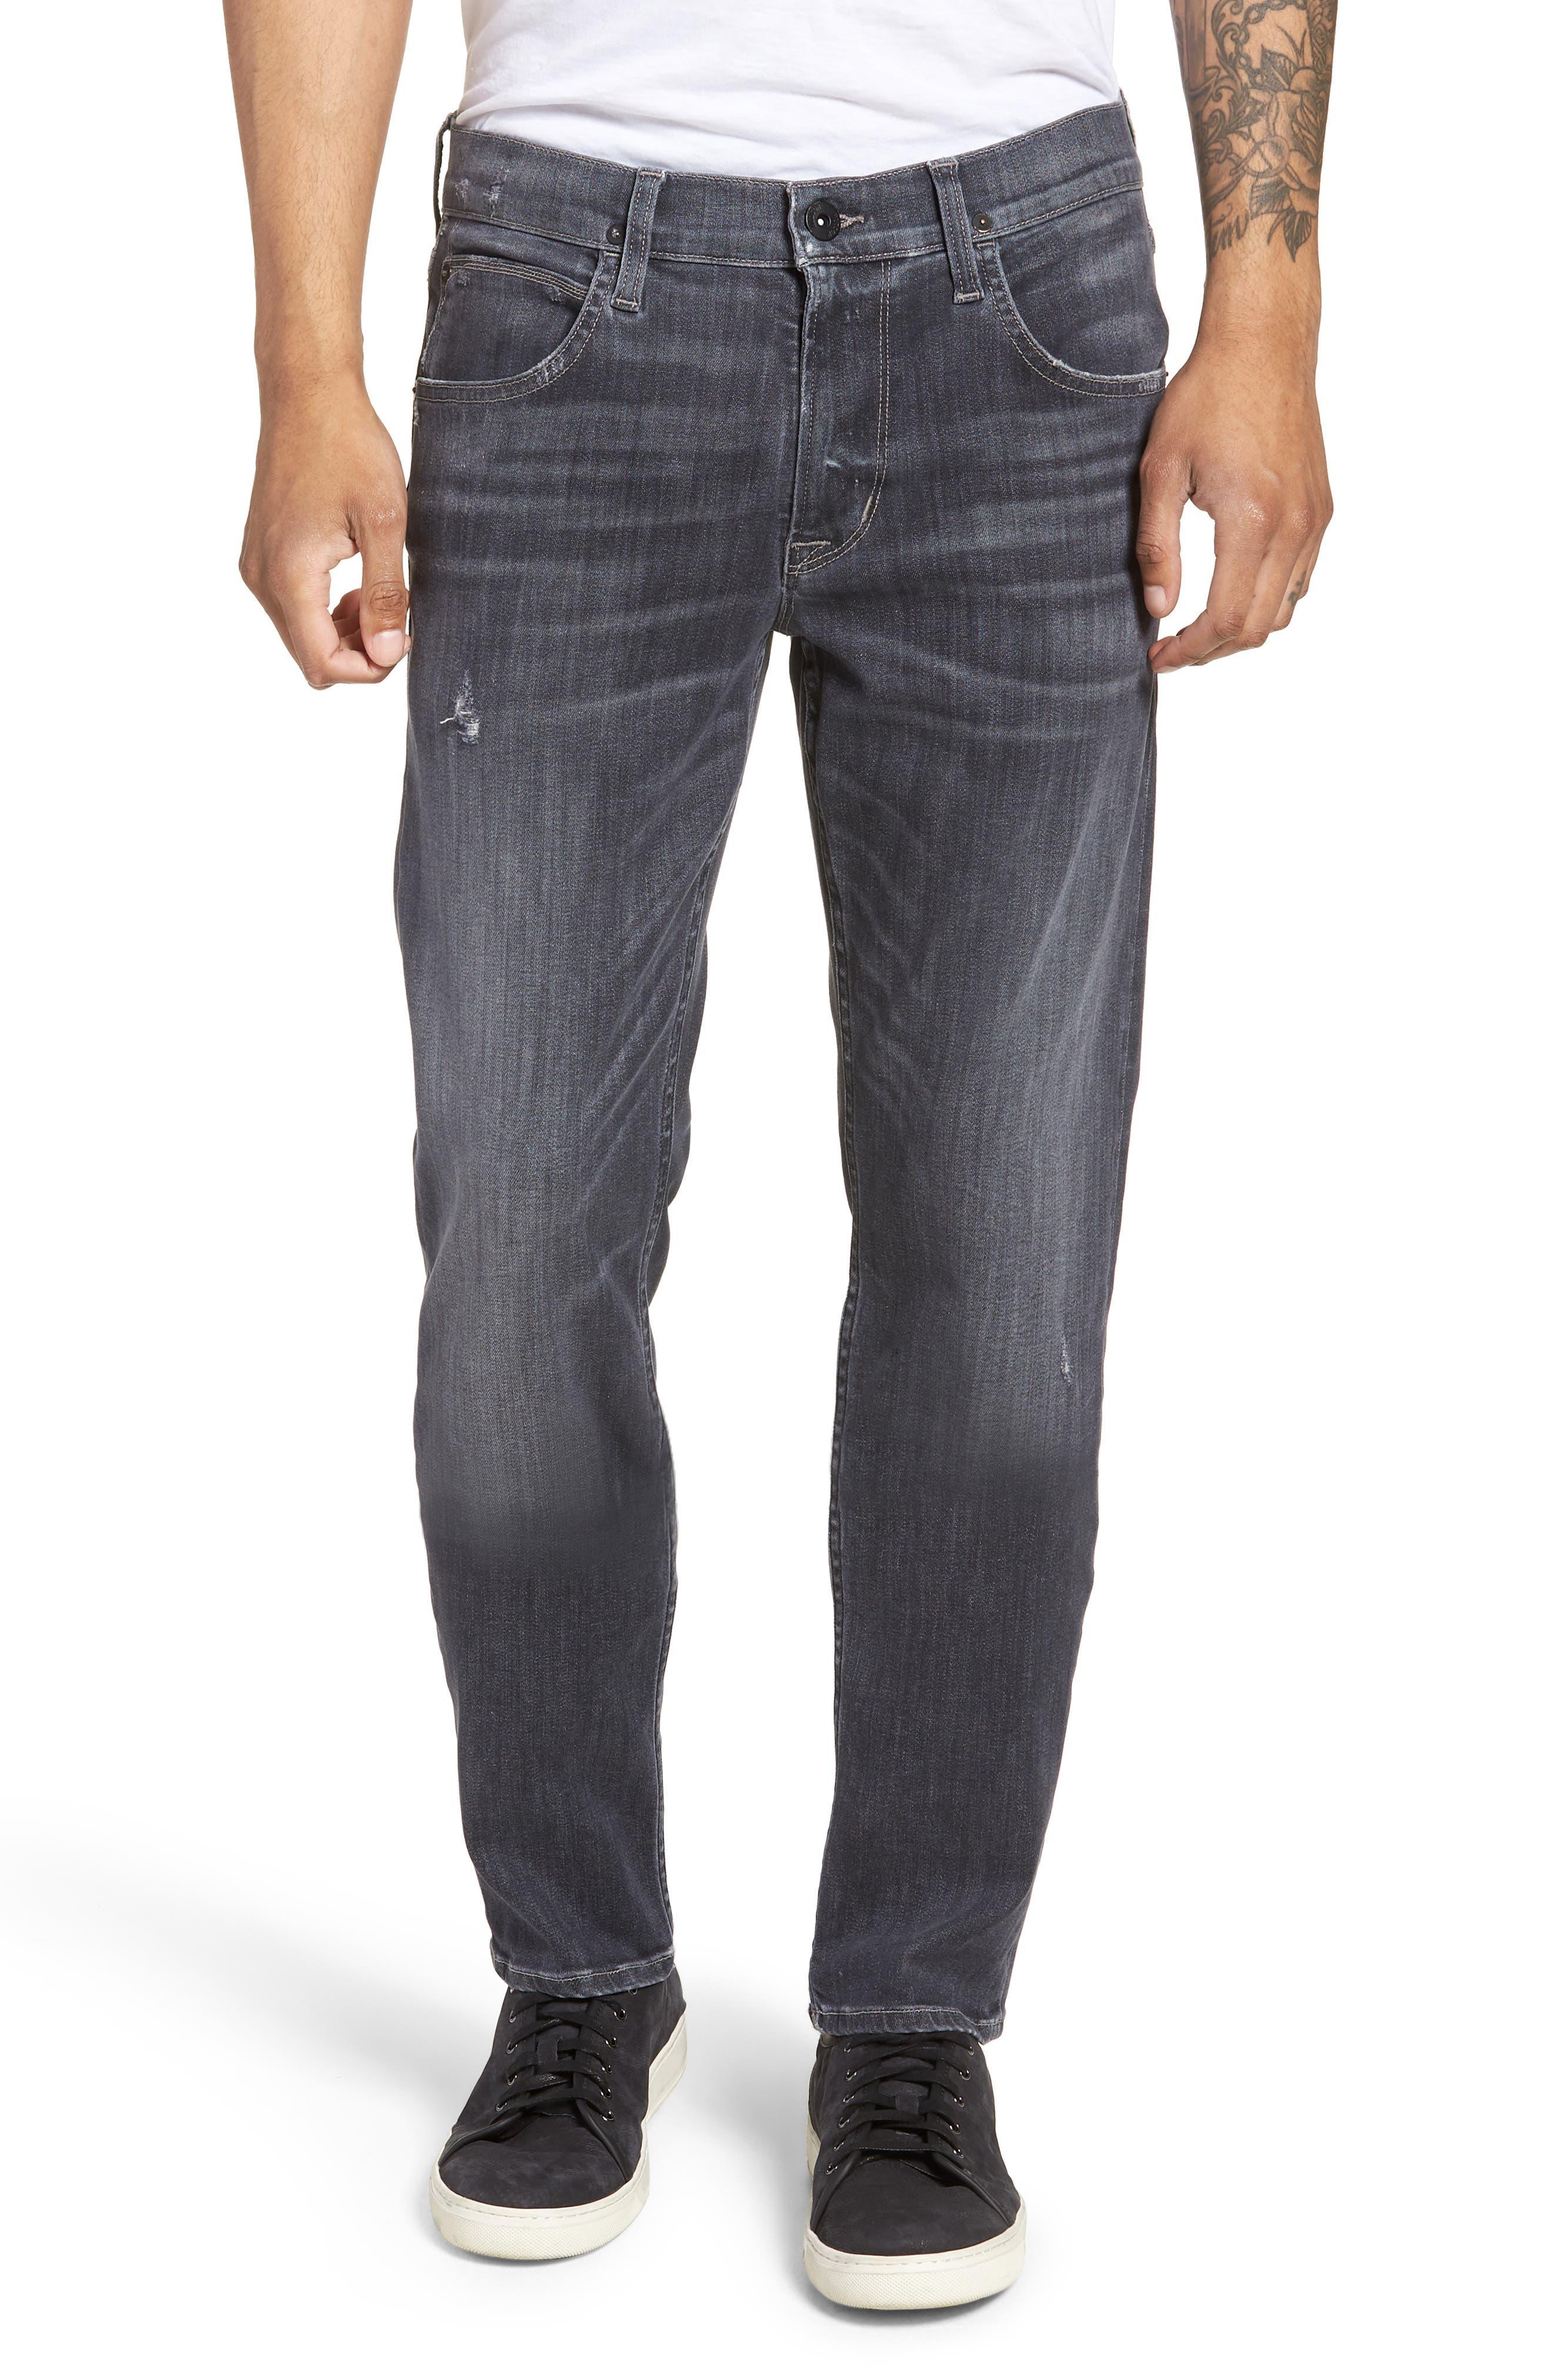 Blake Slim Fit Jeans,                         Main,                         color, Silver Lake